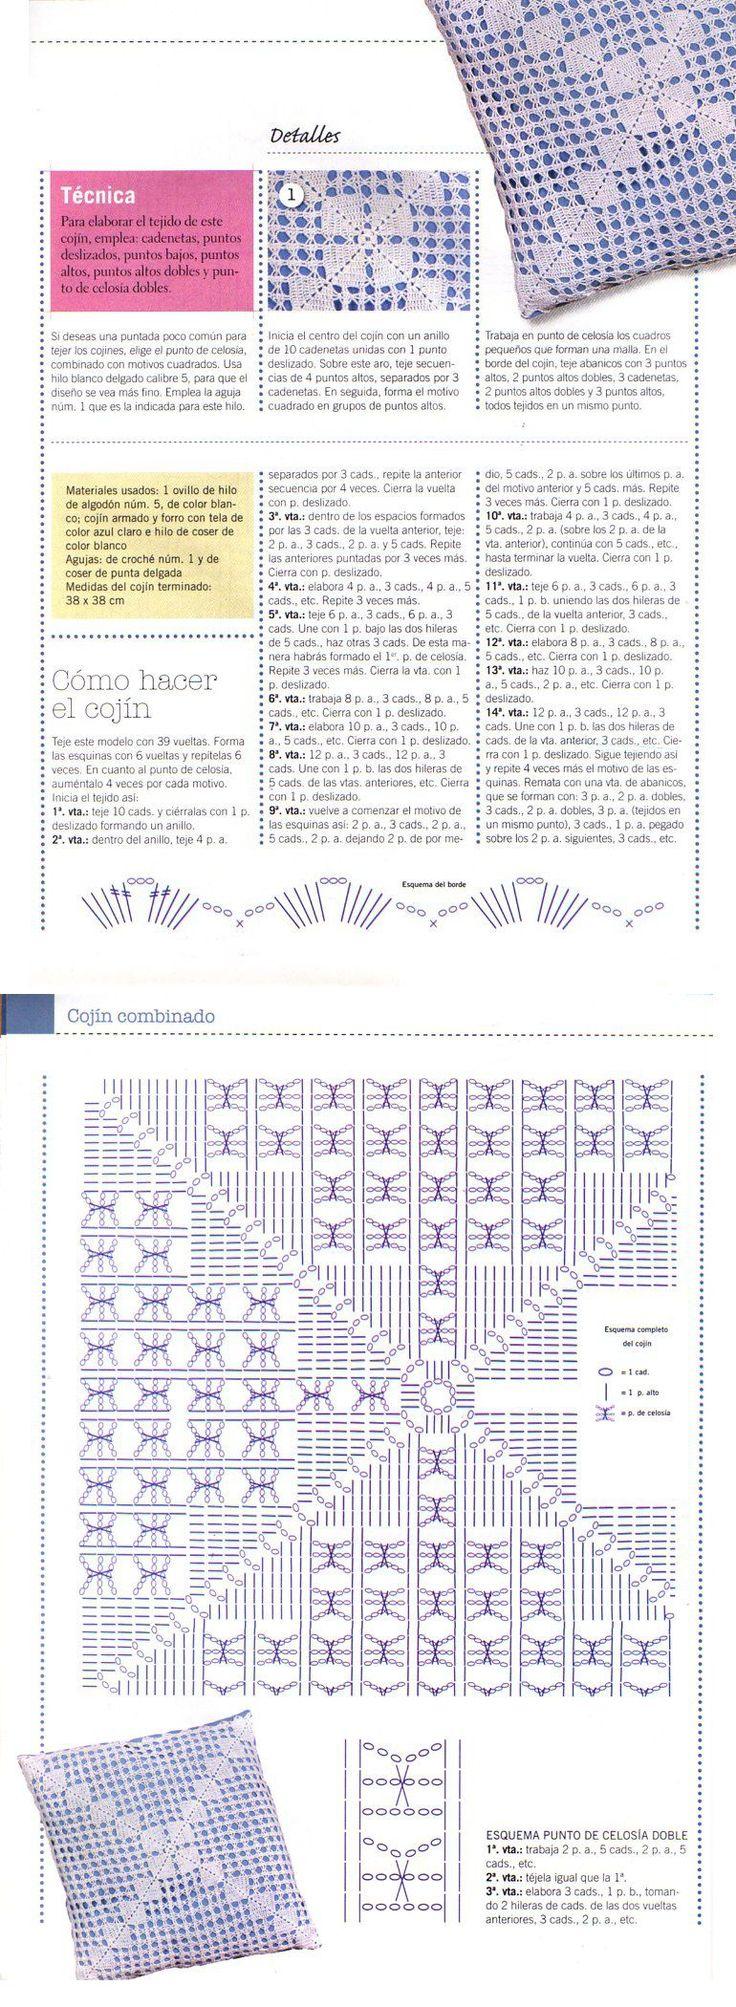 cuscino ::ArtManuais- Tecnicas de Artesanato   Moldes para Artesanato   Passo a Passo::